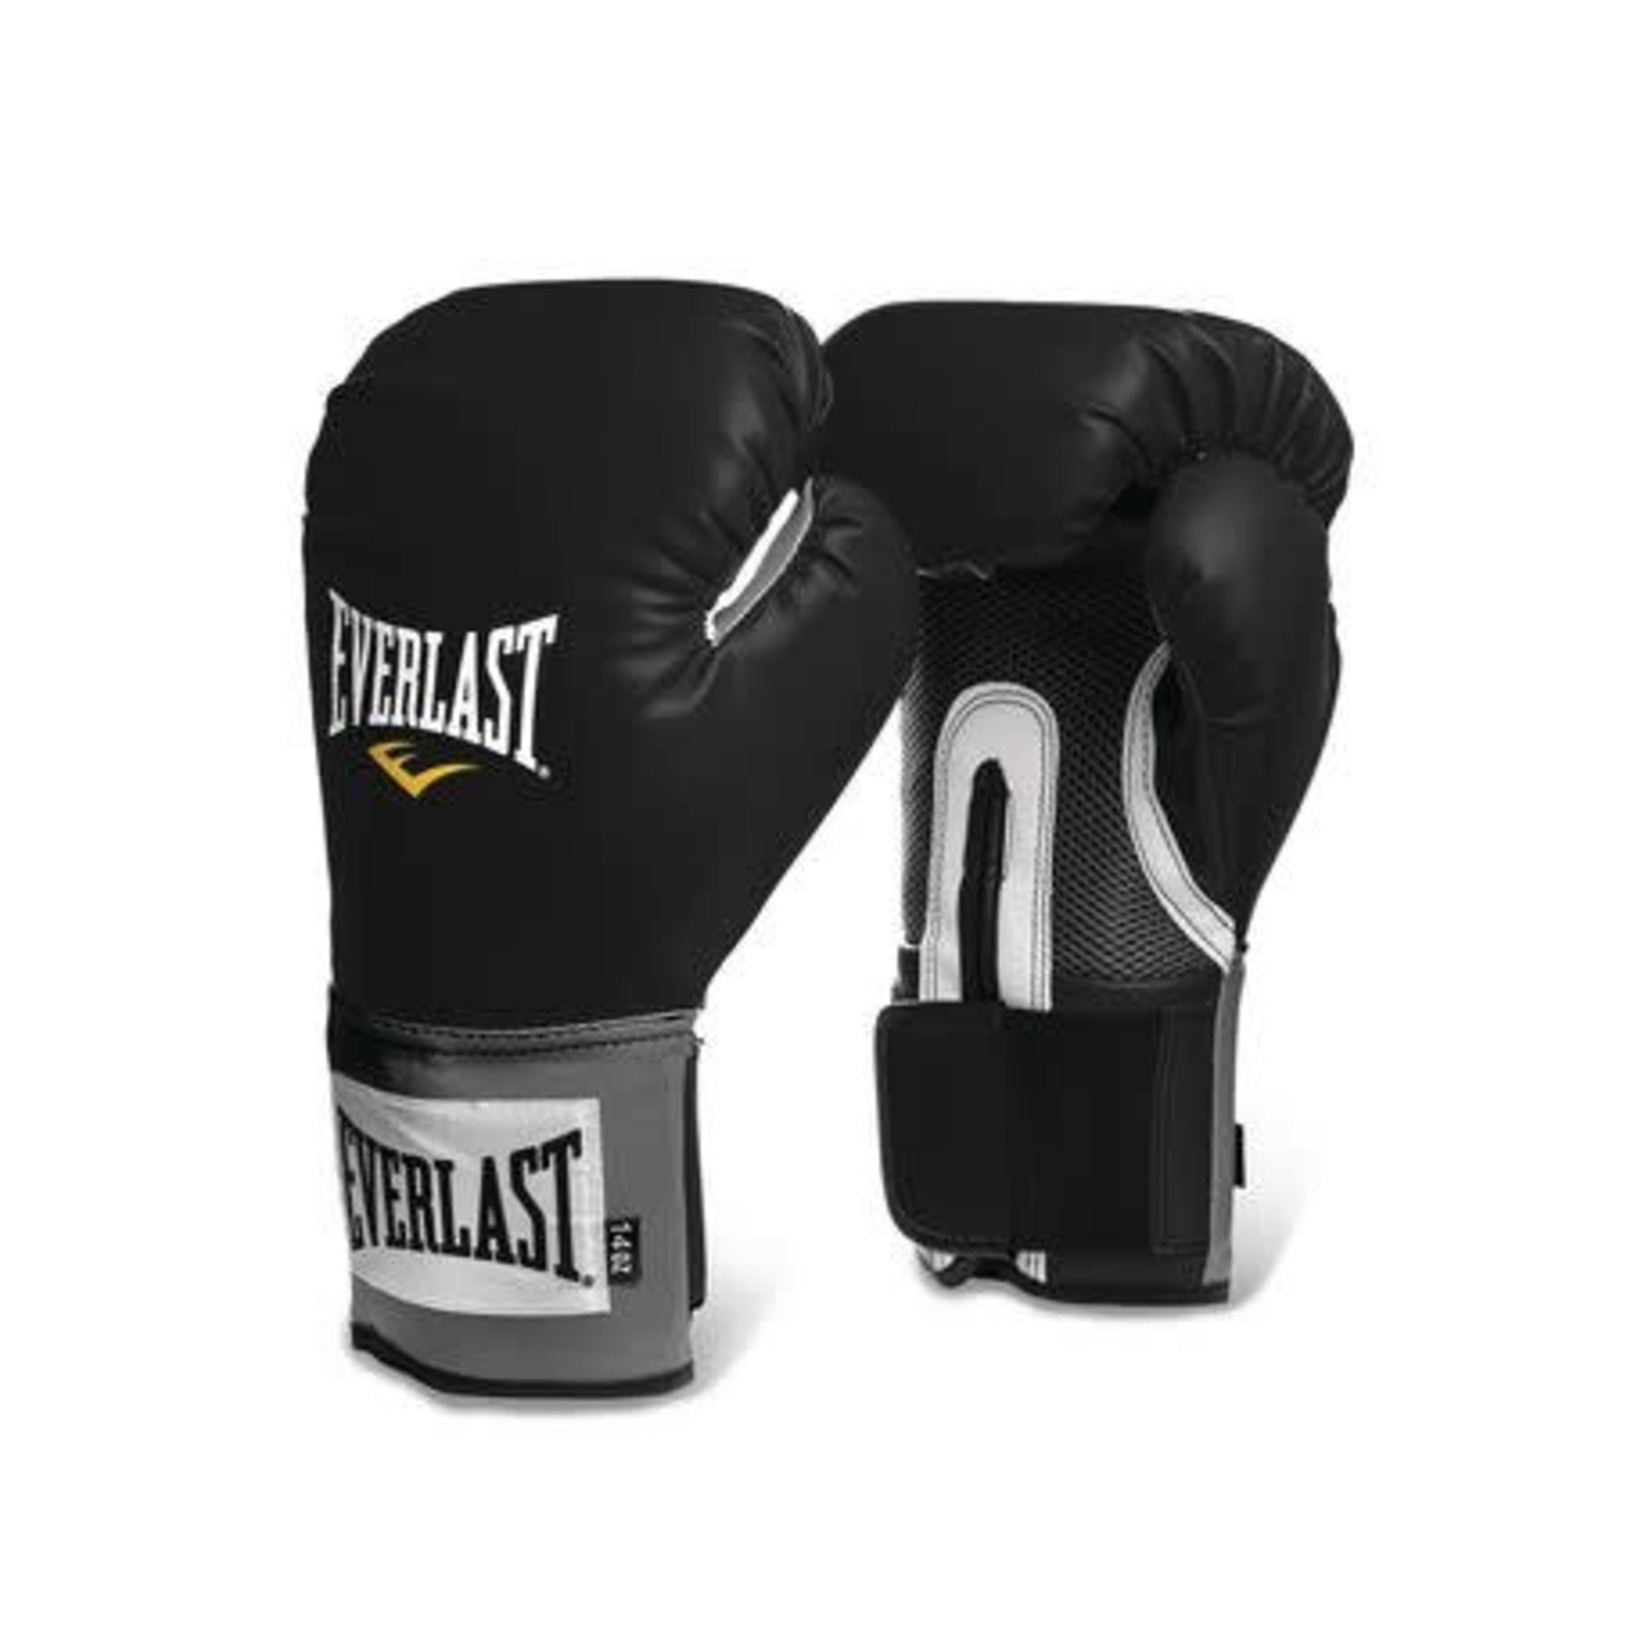 Everlast Everlast Boxing Gloves, Pro Style Training